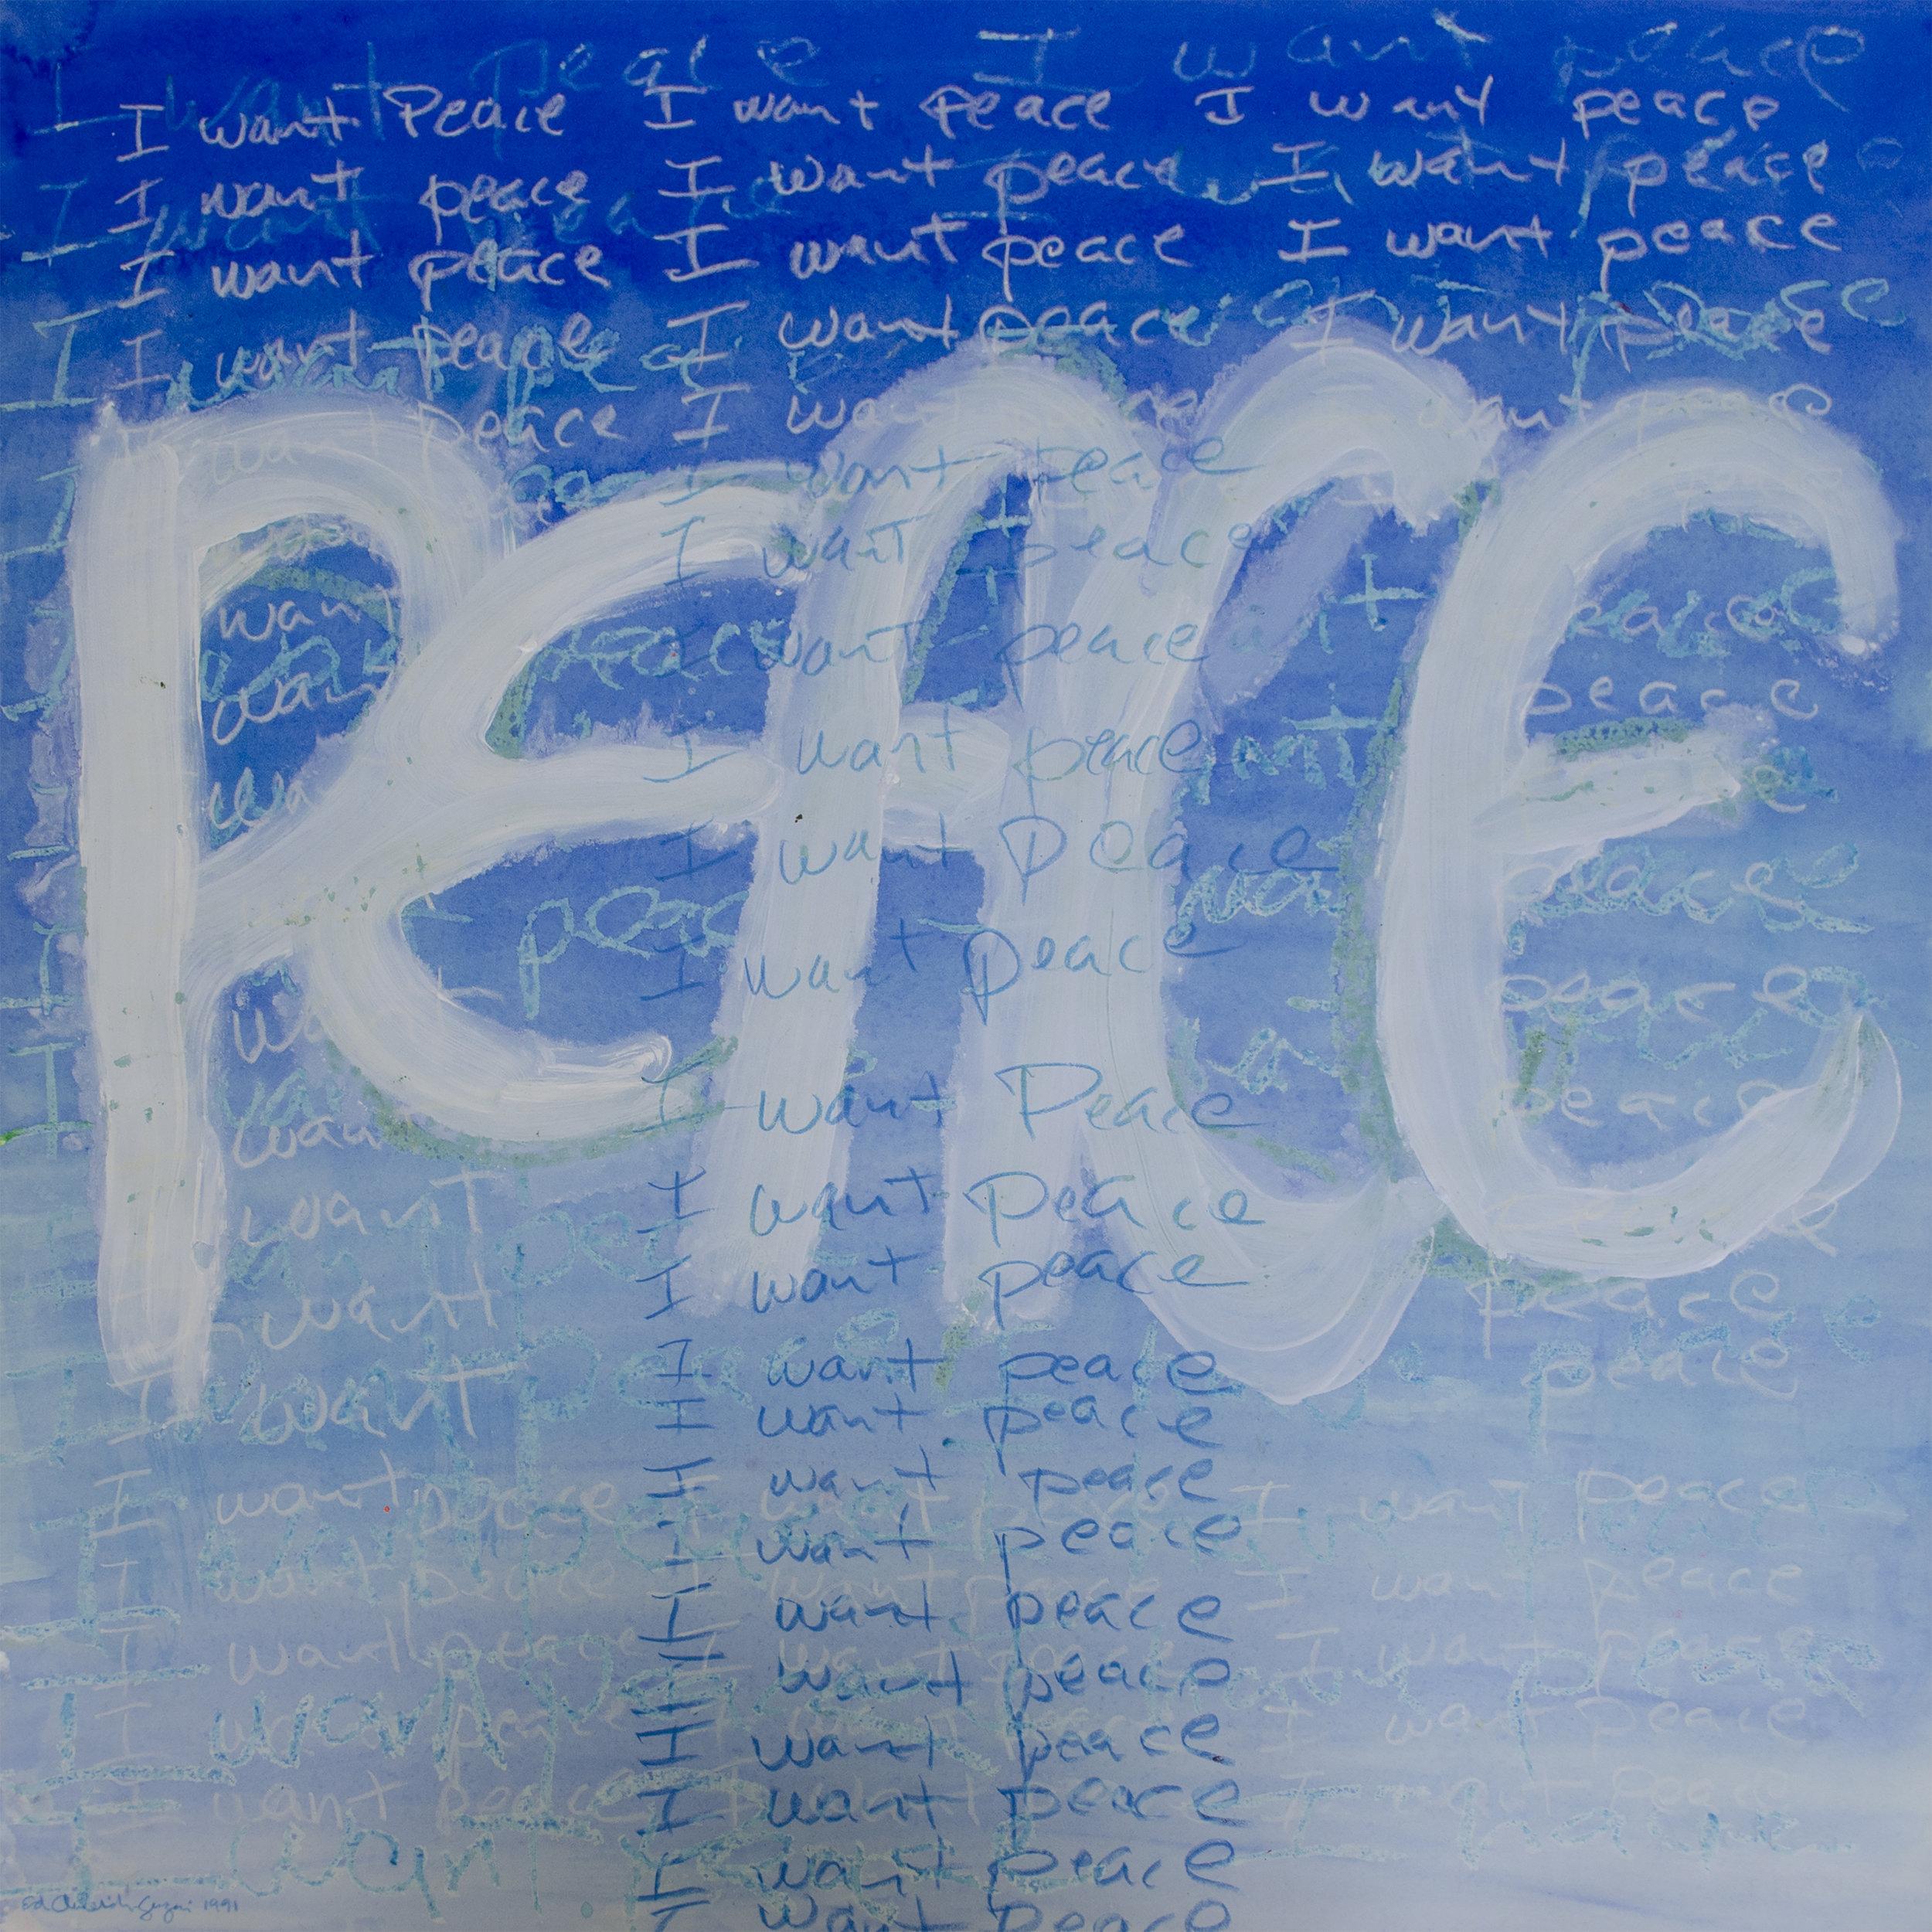 I want peace, 1991